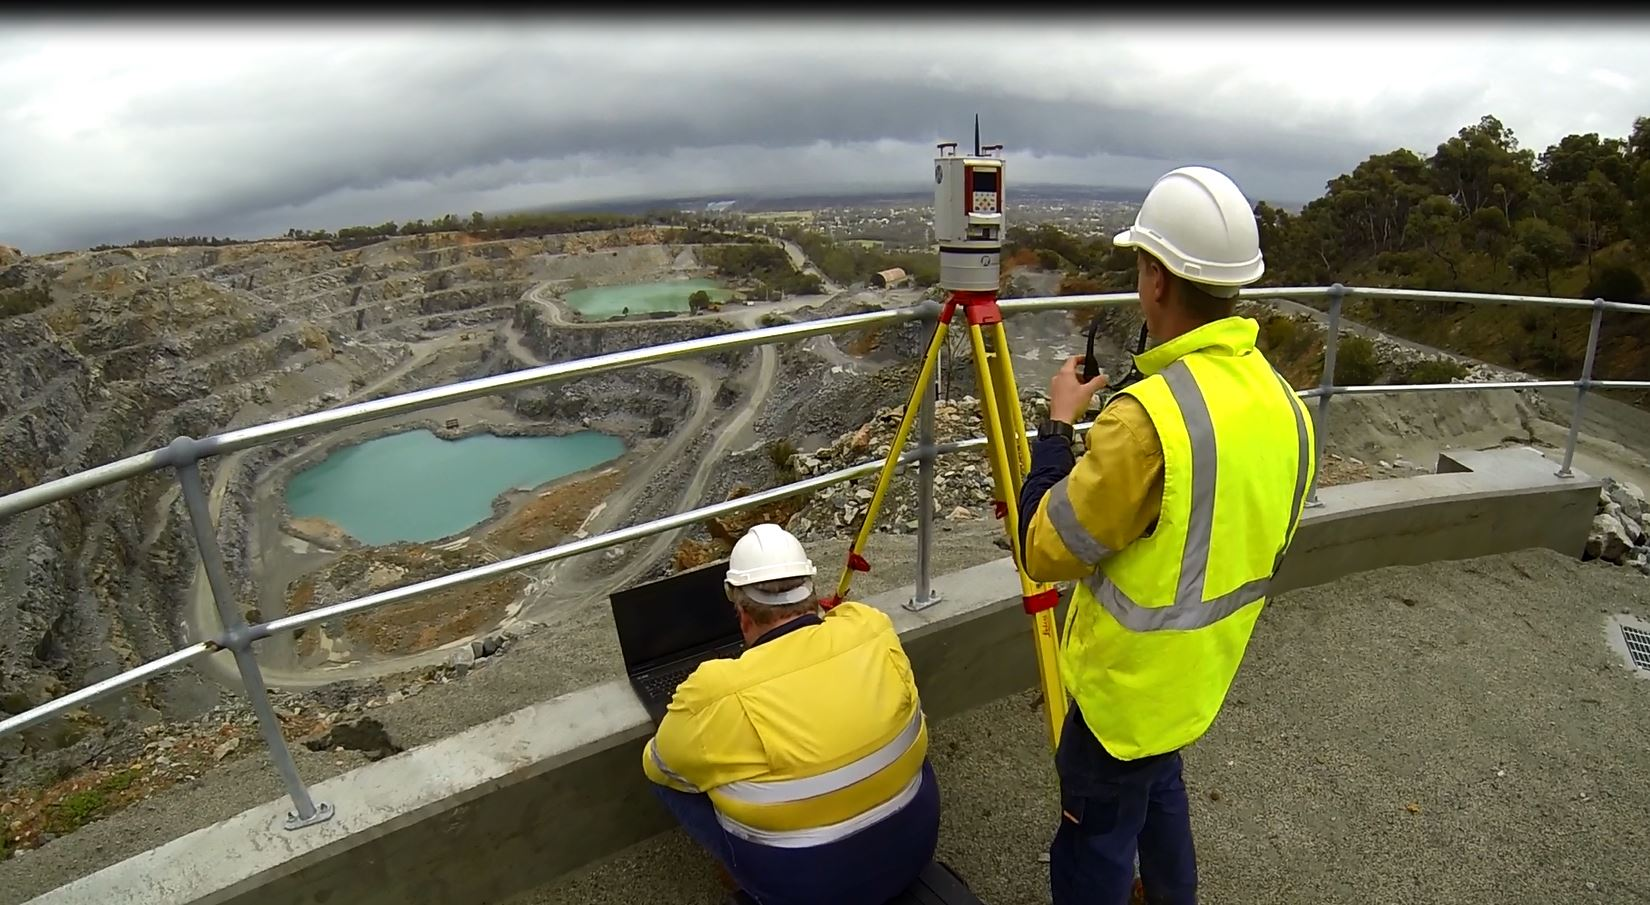 Photo from: Land Surveys NPJS Pty Ltd